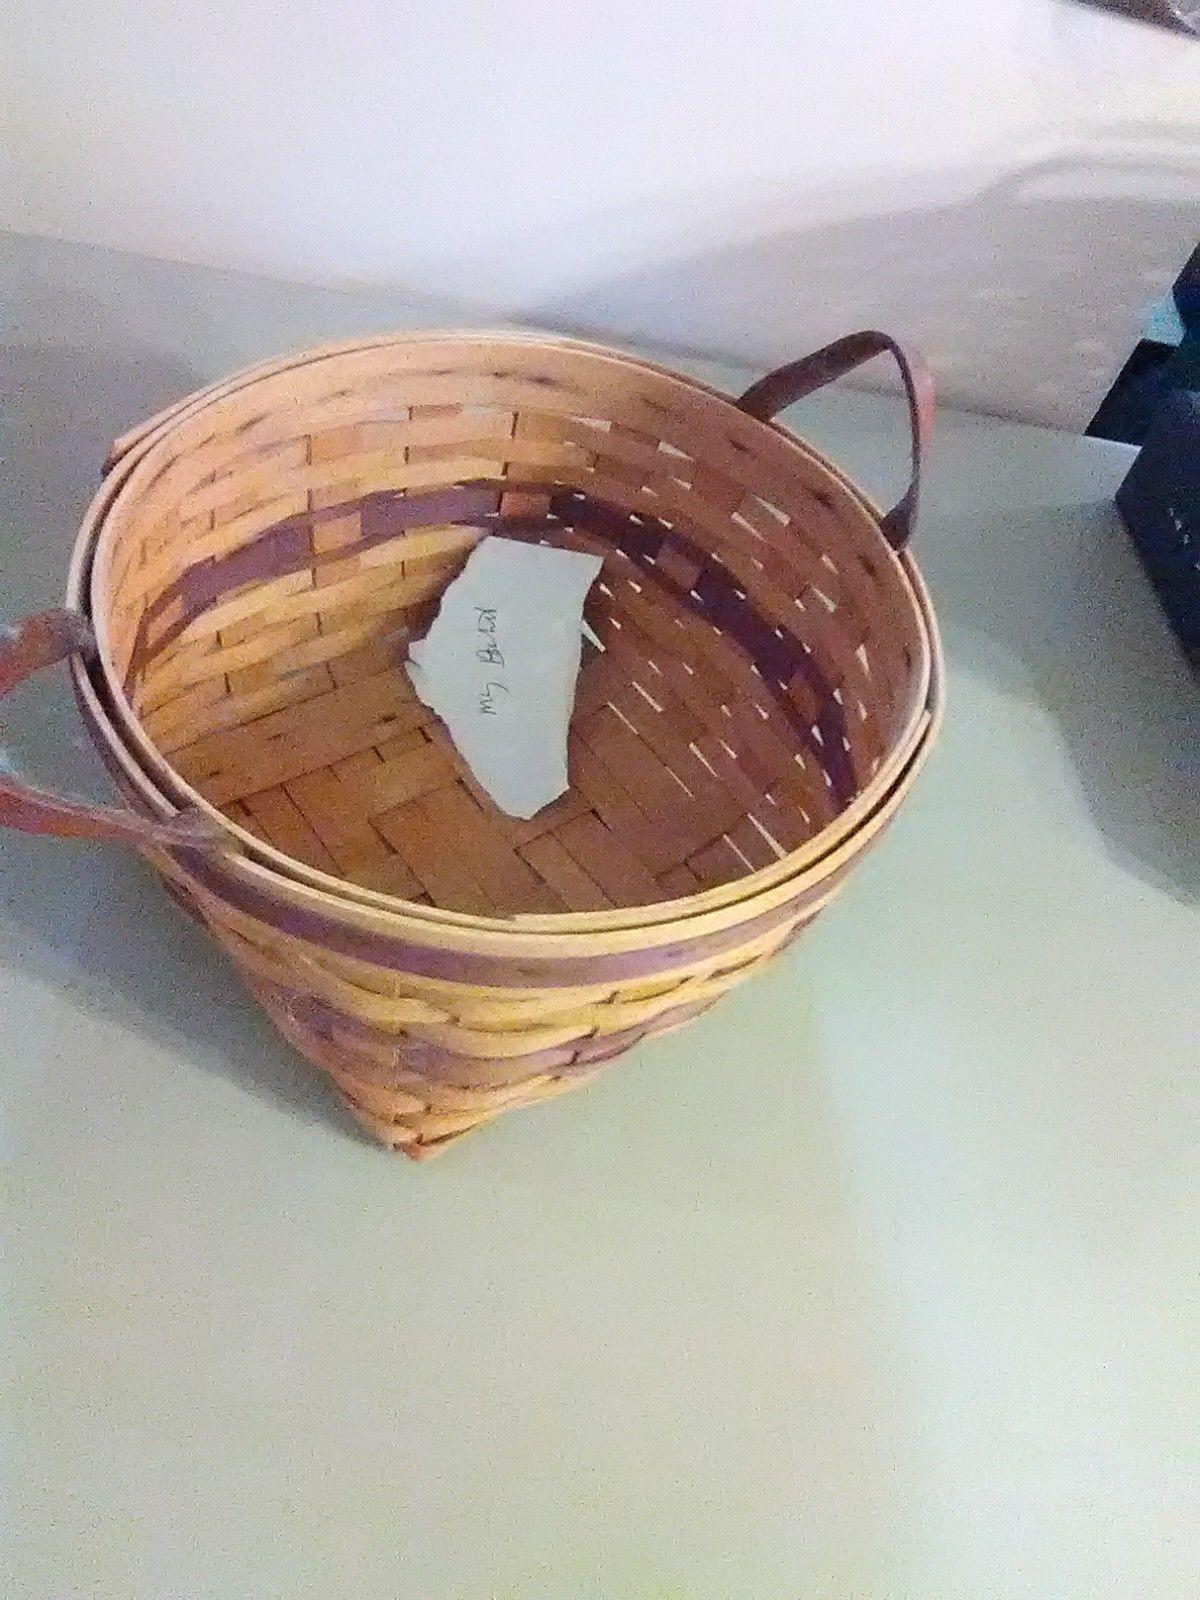 Longaberger May Basket - 1997 - Leather Strap Handles